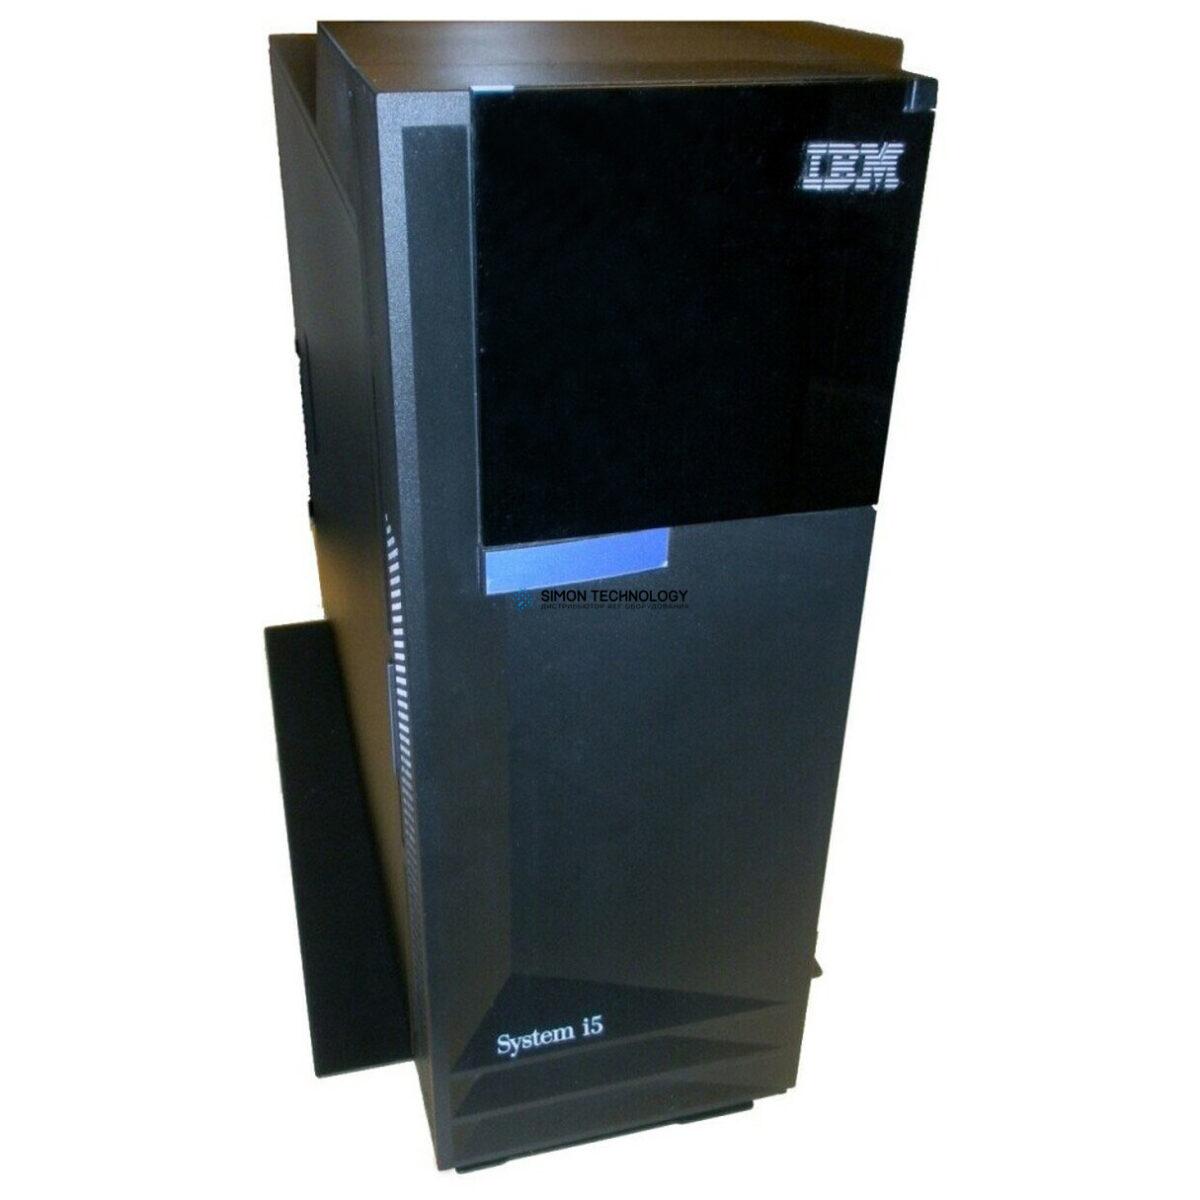 Сервер IBM 1-Core - 2400 CPW - P10 (9406-520-0903-7452)